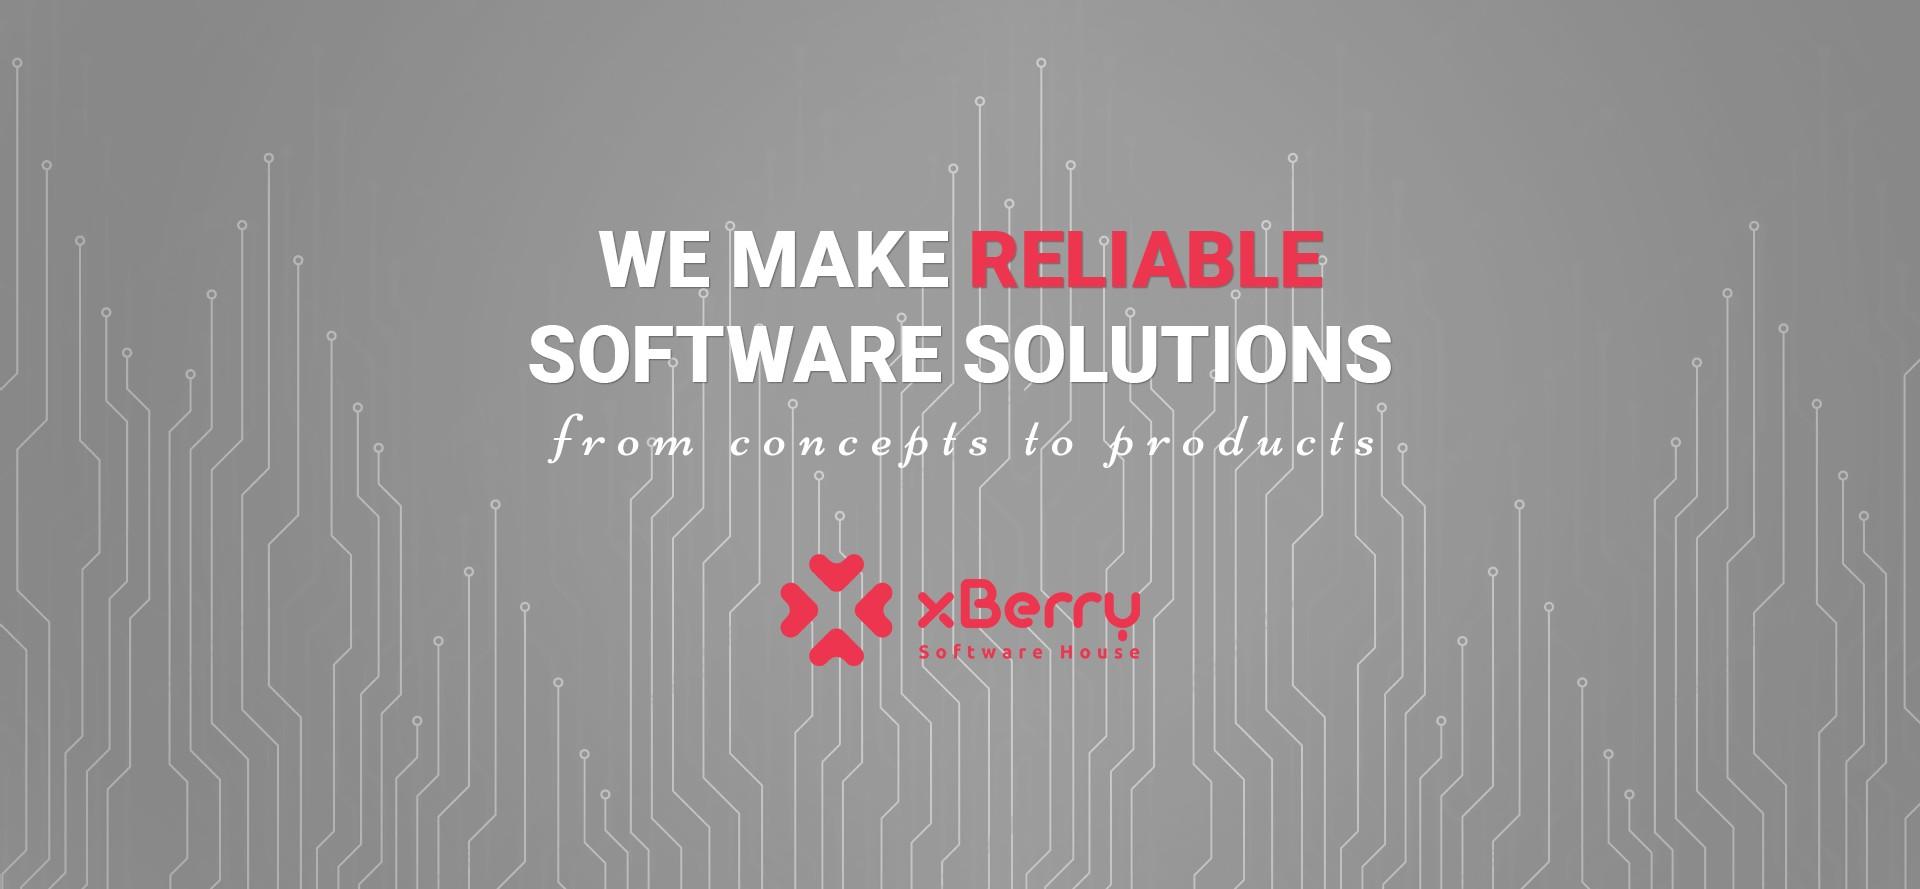 xBerry - Software Development | LinkedIn